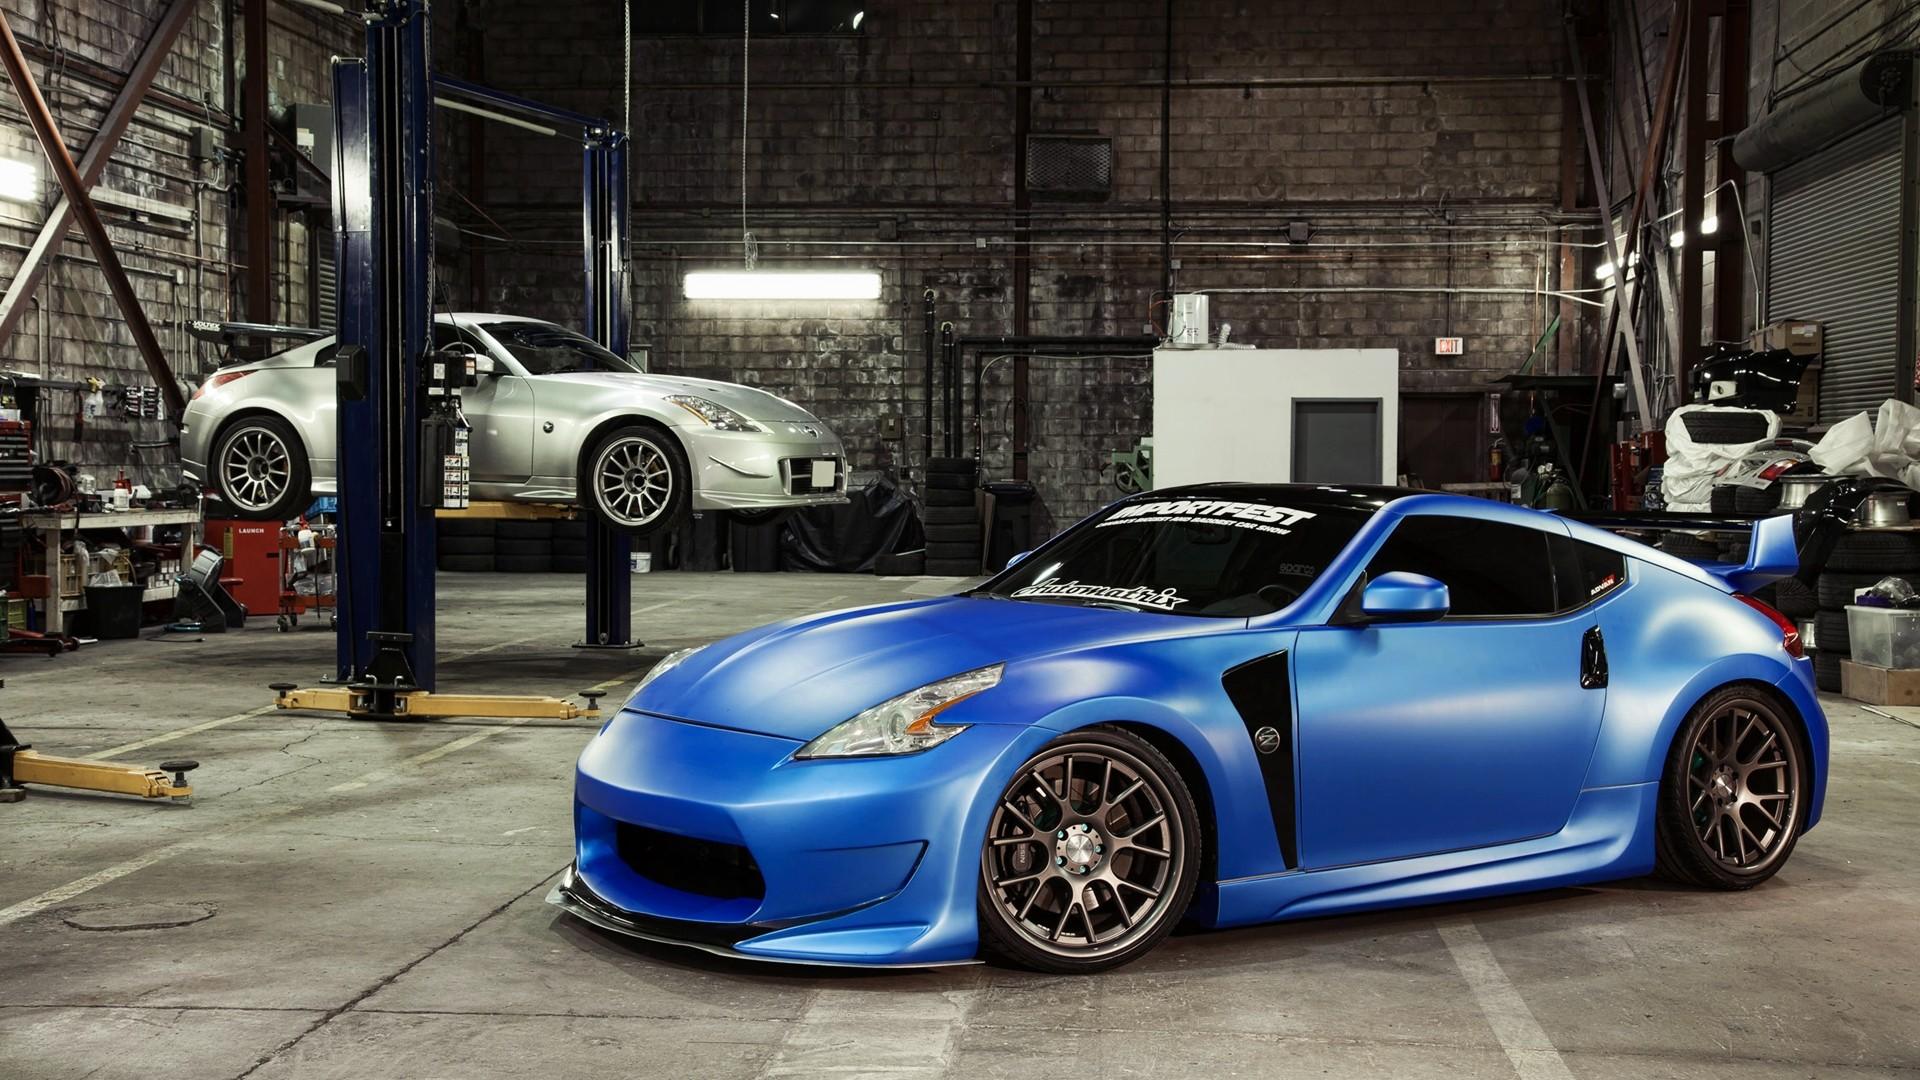 Wallpaper Blue Nissan 350z Body Kit 1920x1080 Wallpaper Teahub Io